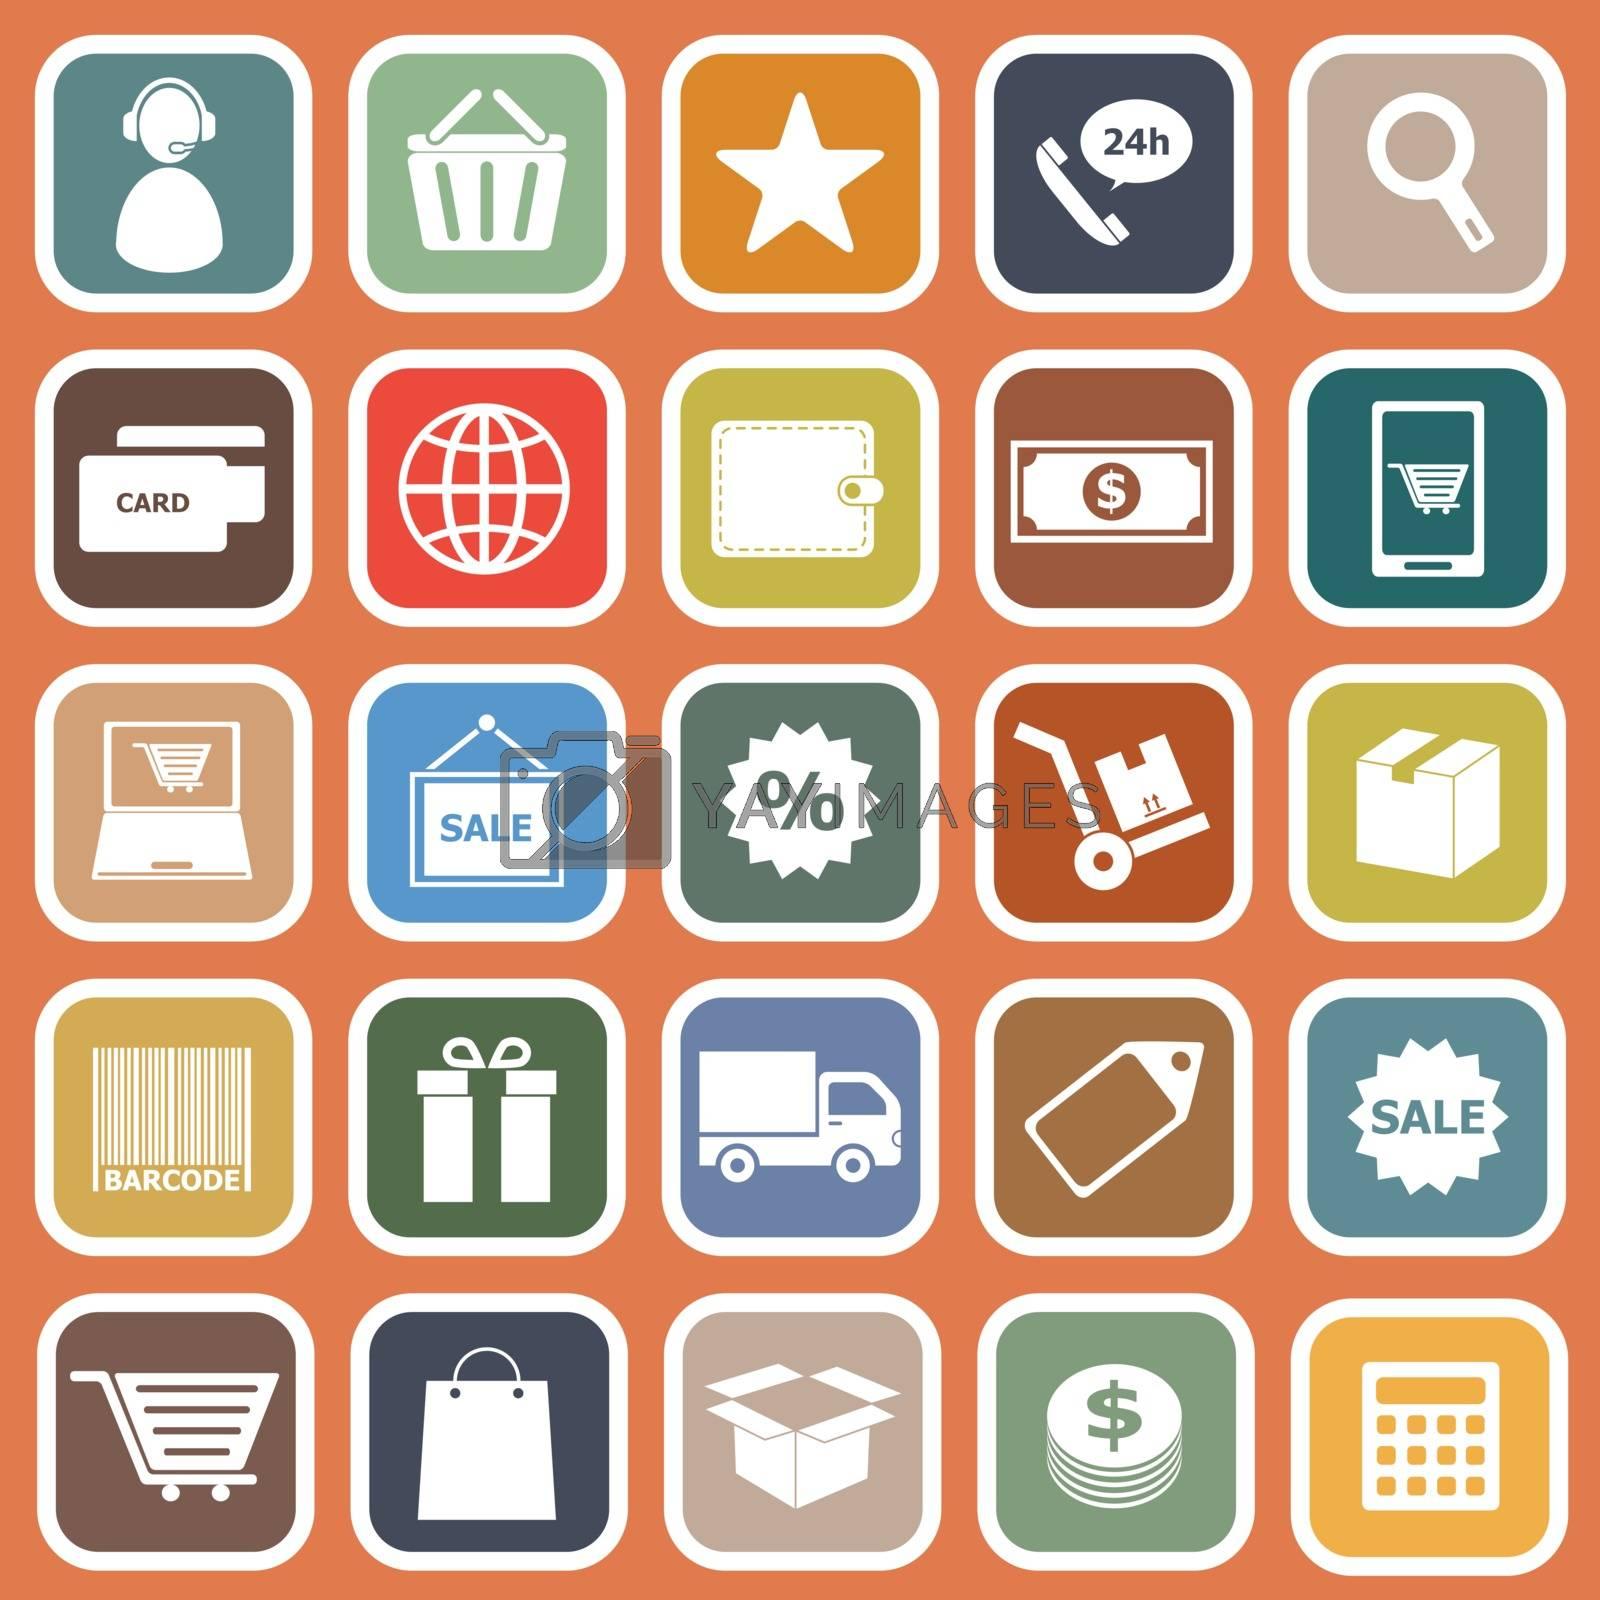 E-commerce flat icons on orange background, stock vector